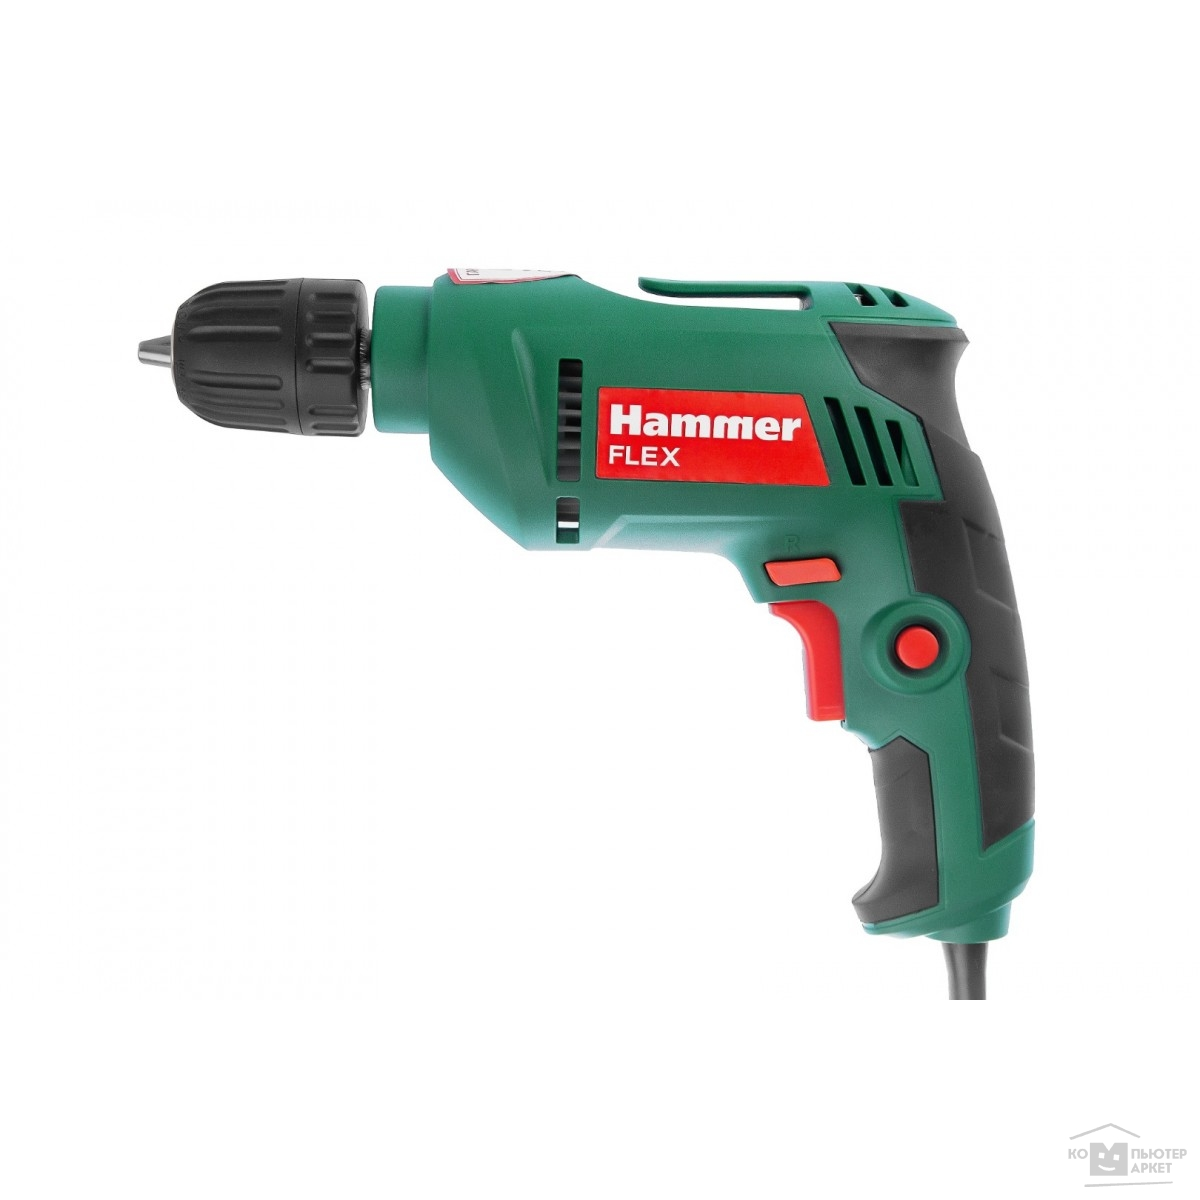 Hammer Аккум.дрель DRL500C  [630796] { 500Вт 10мм БЗП 0-3200об/мин реверс}/HAMMER 630796 630796